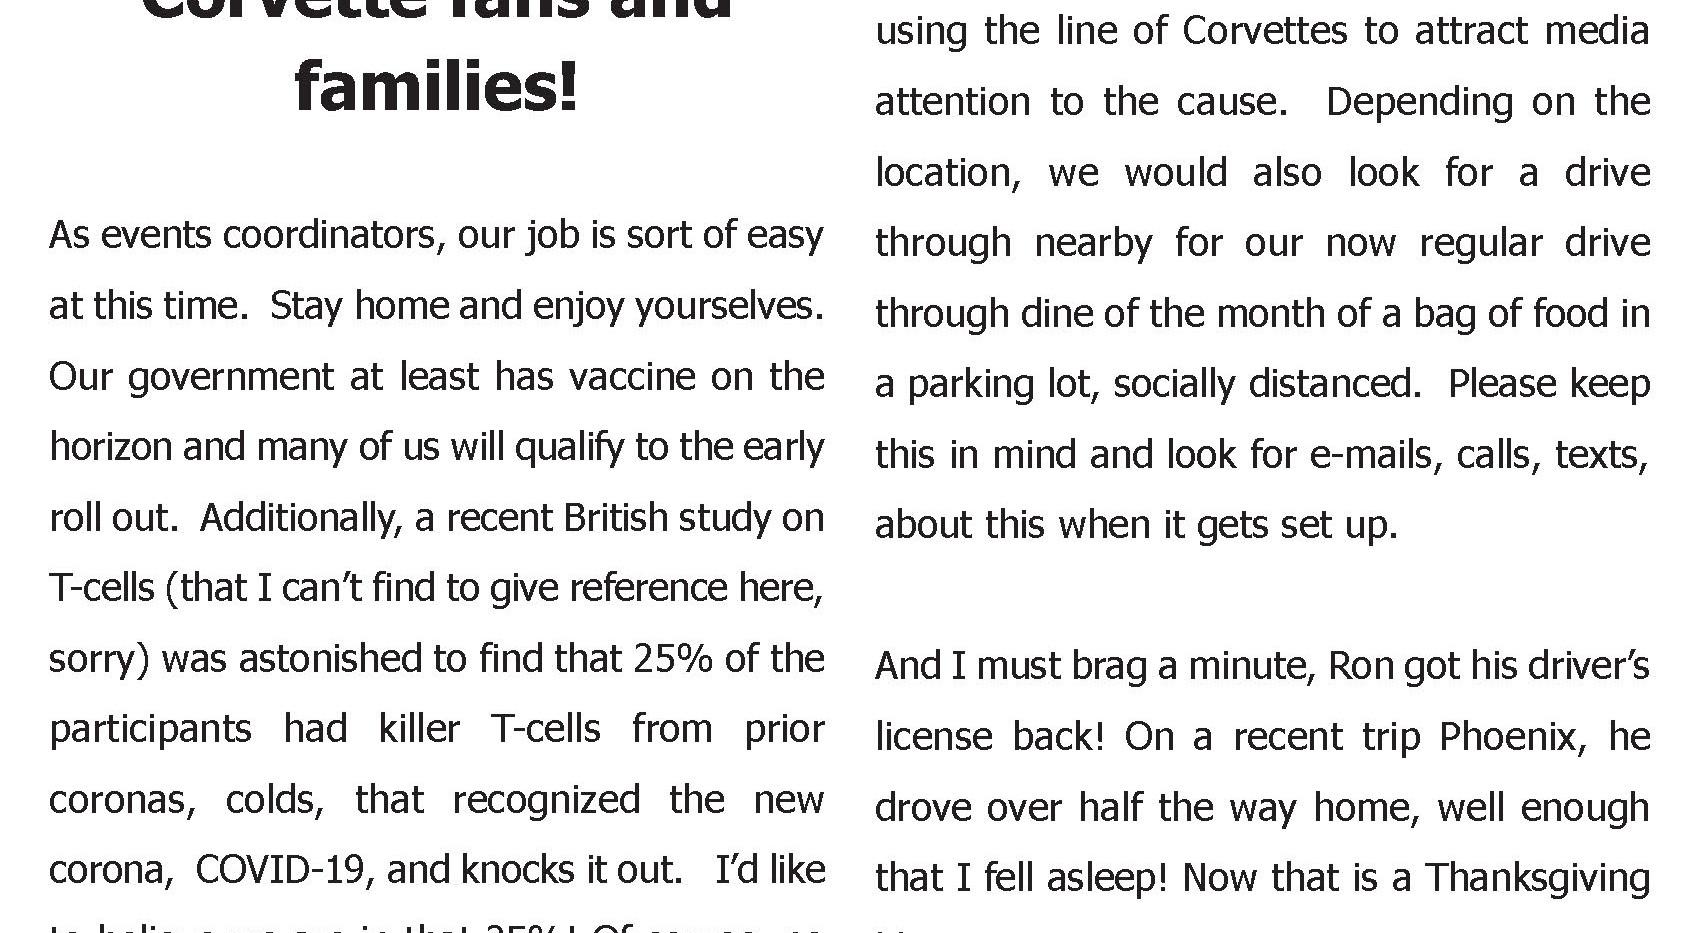 corvettes west news 1220_Page_04.jpg